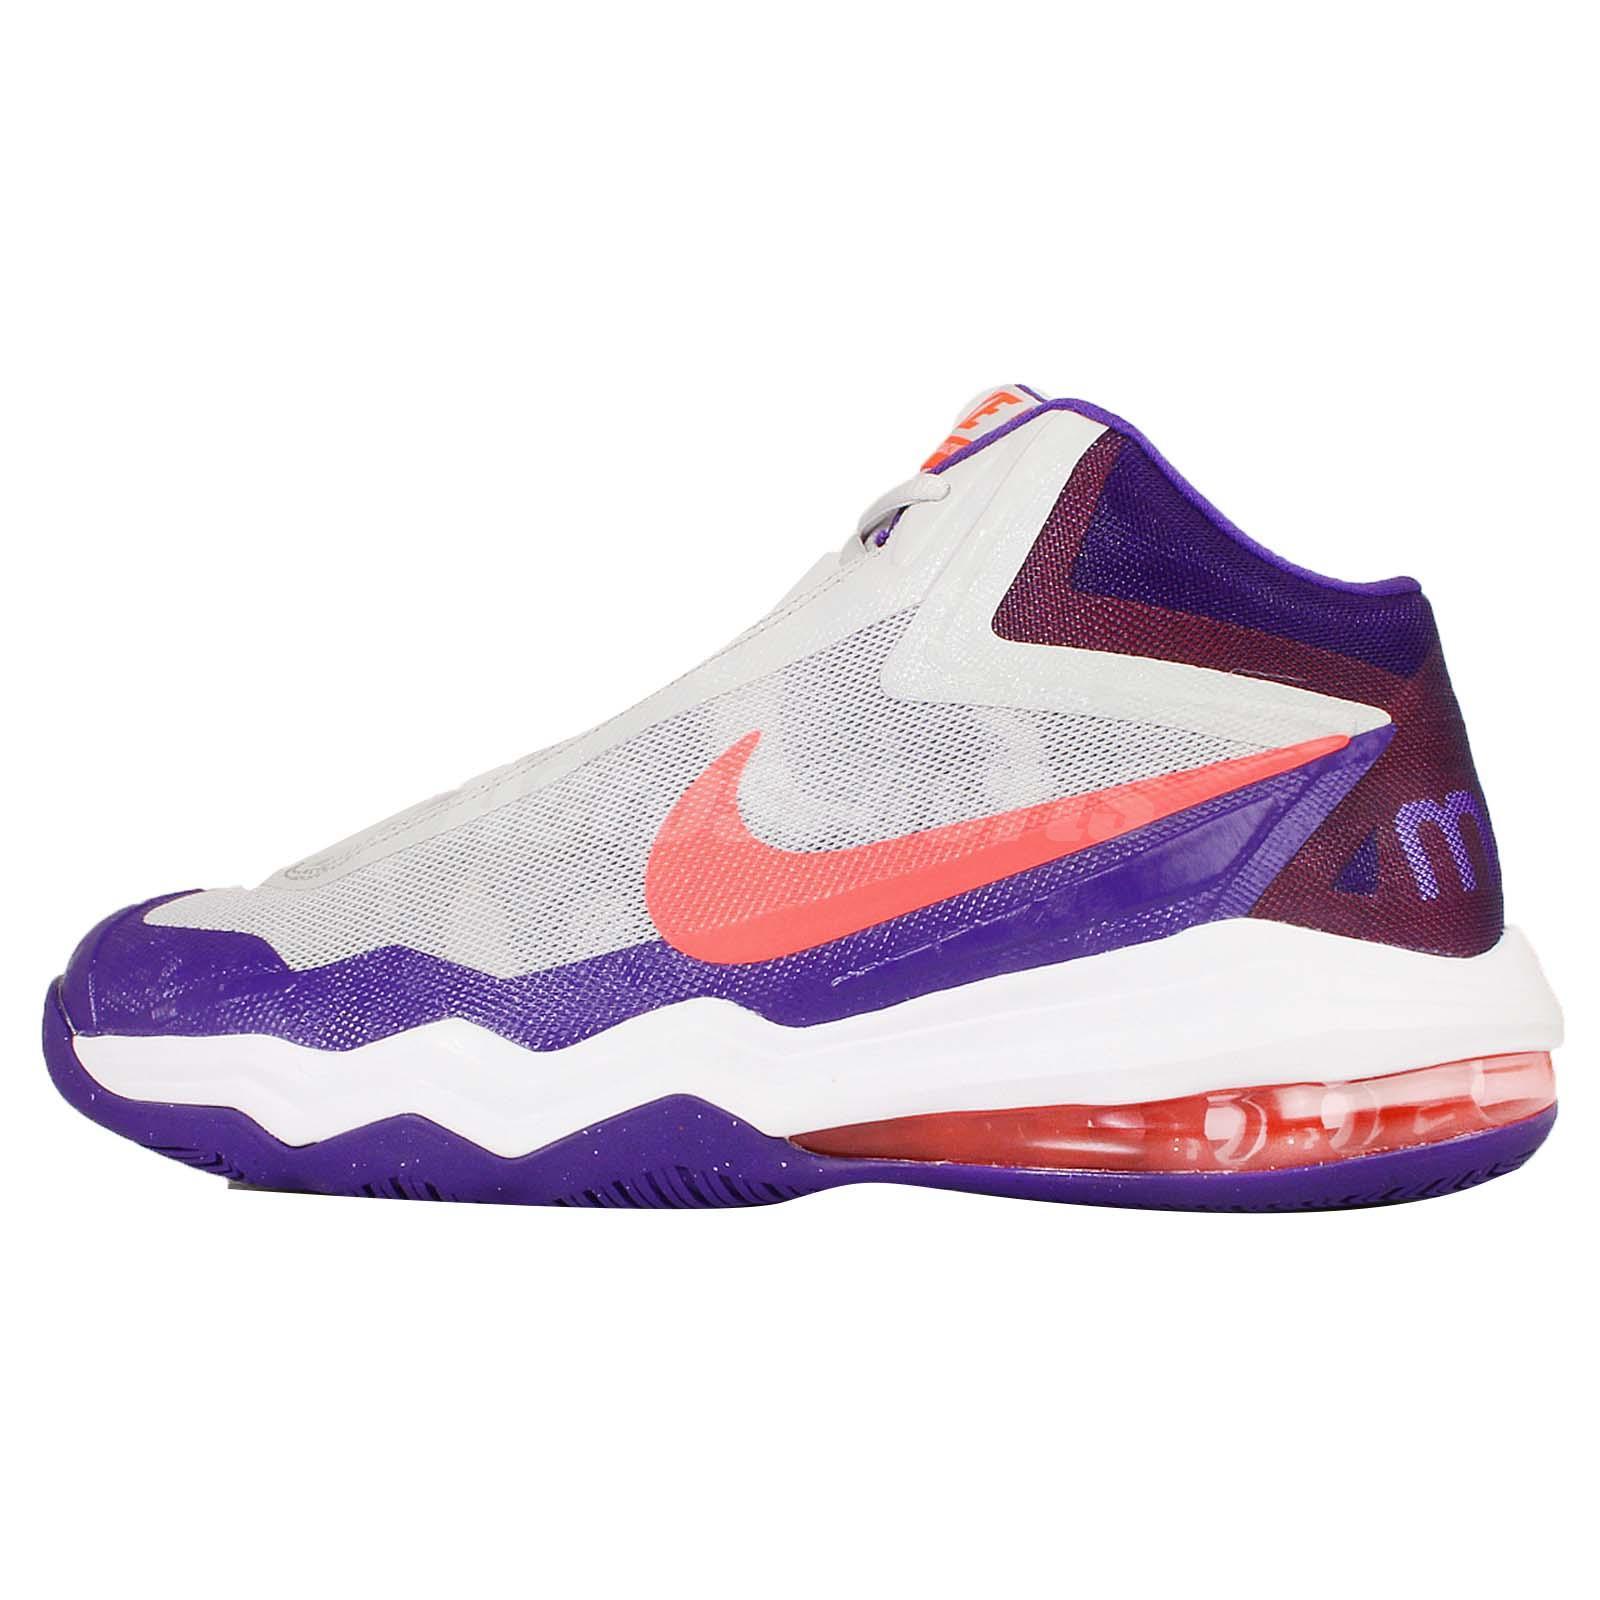 Anthoy Davis Shoes For Kids